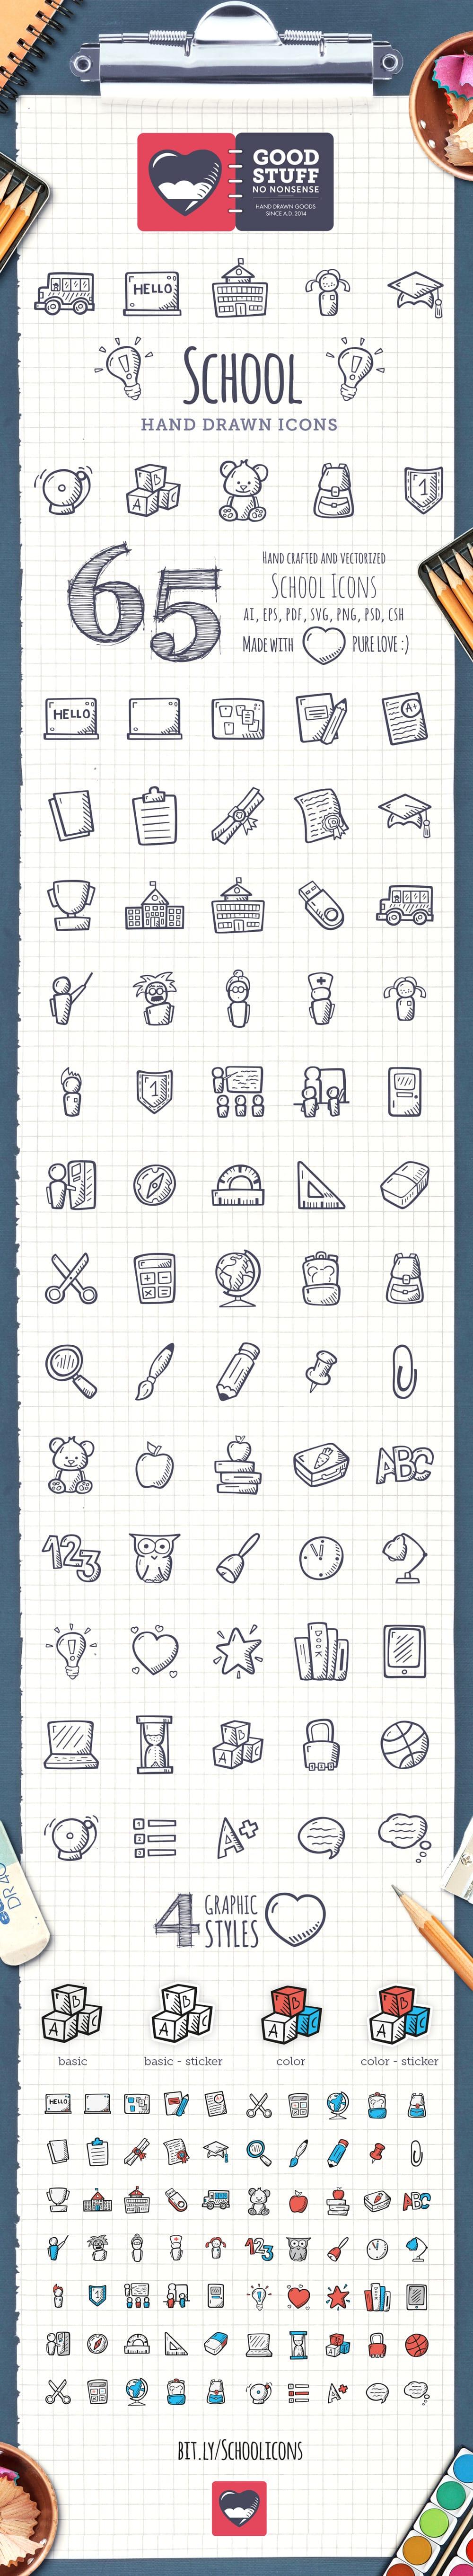 School Icons - Hand Drawn Icons